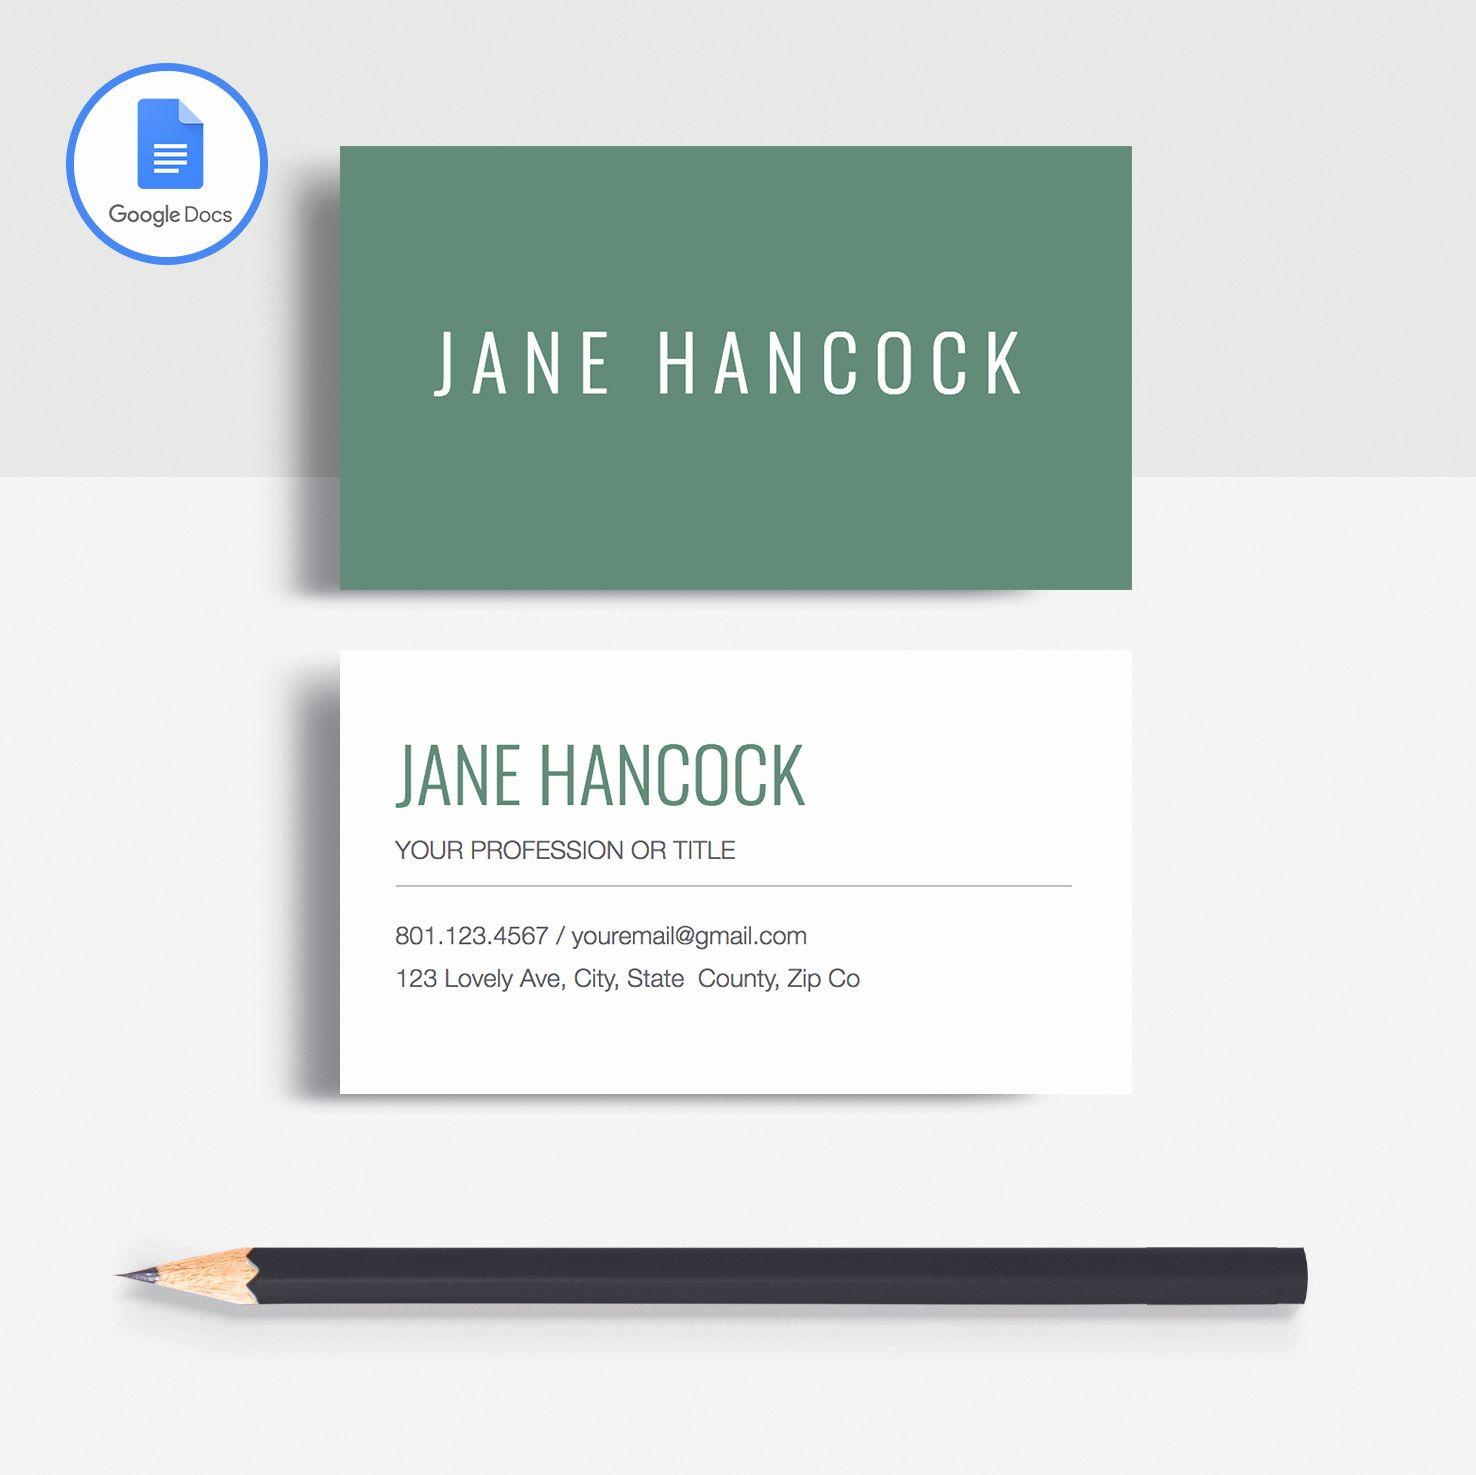 Card Template Docs Inspirational Jane Hancock In